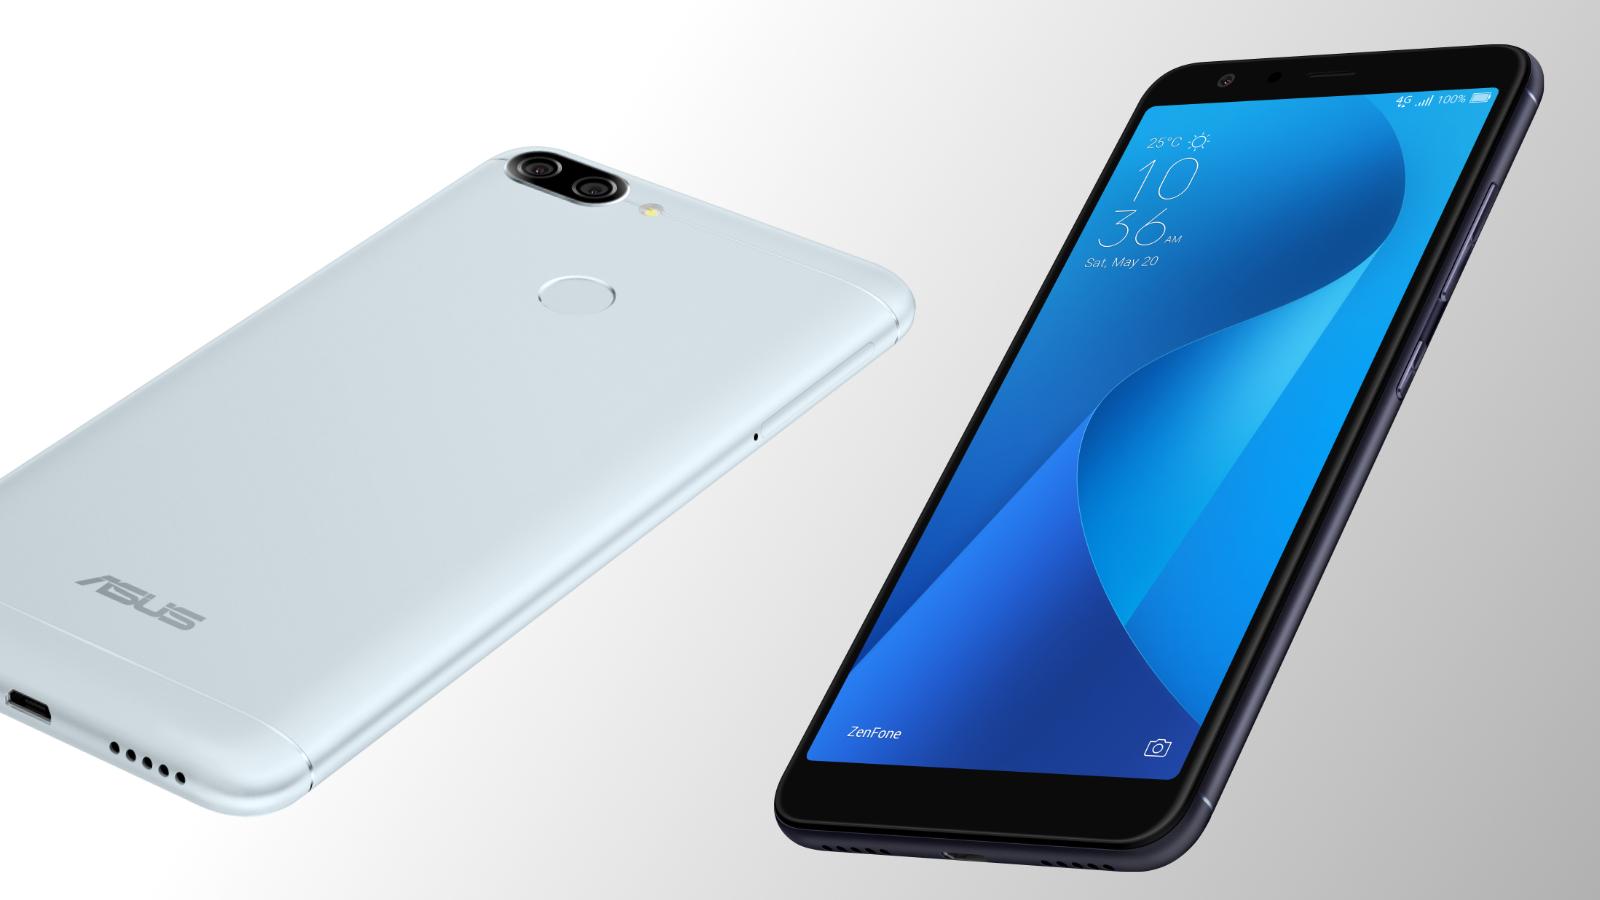 Asus Zenfone Max Plus za pouhých 2 000 Kč [sponzorovaný článek]